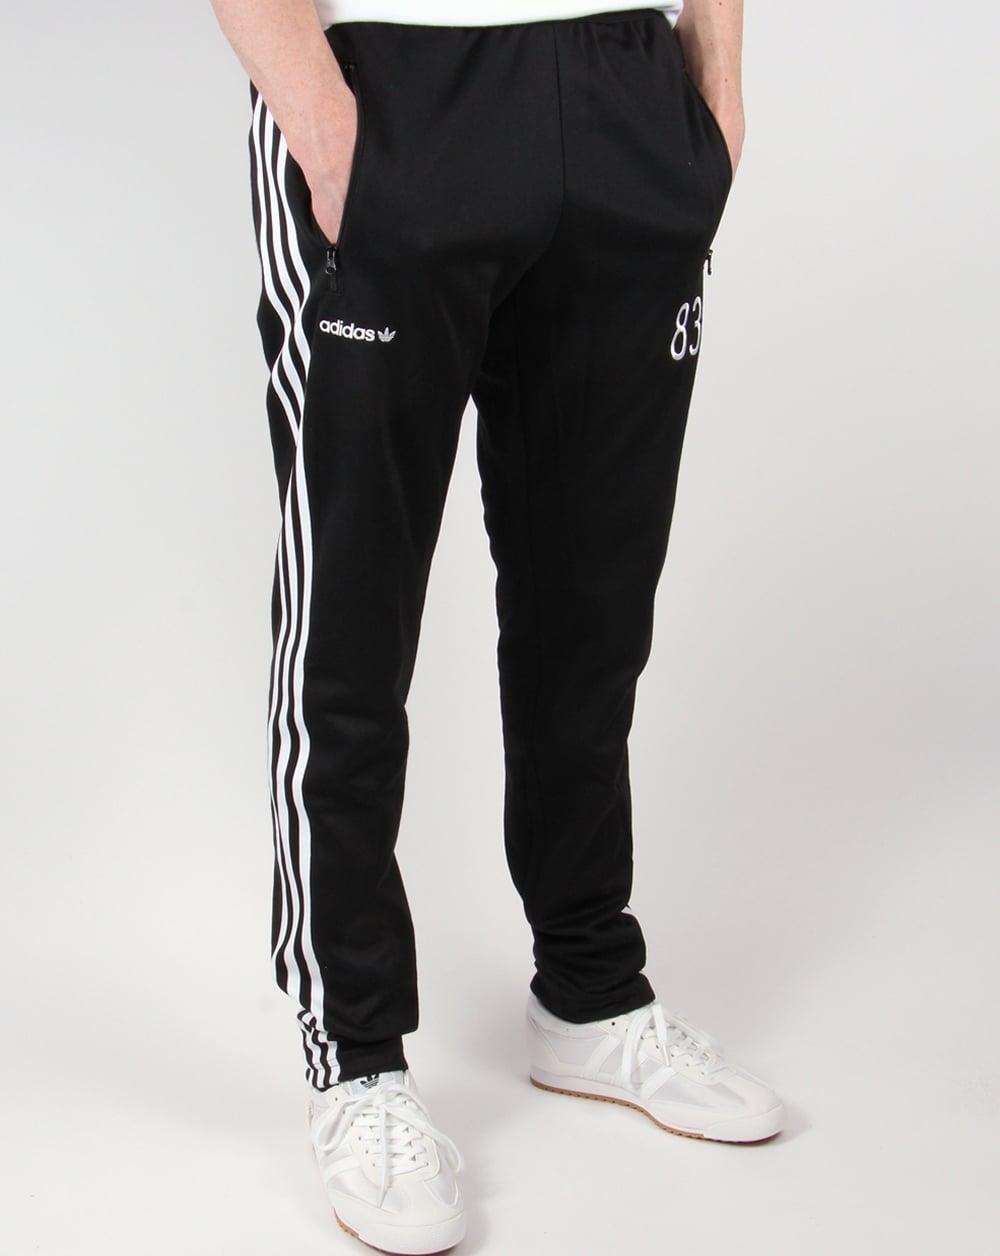 adidas originals 83c track pants blackjoggingbottoms